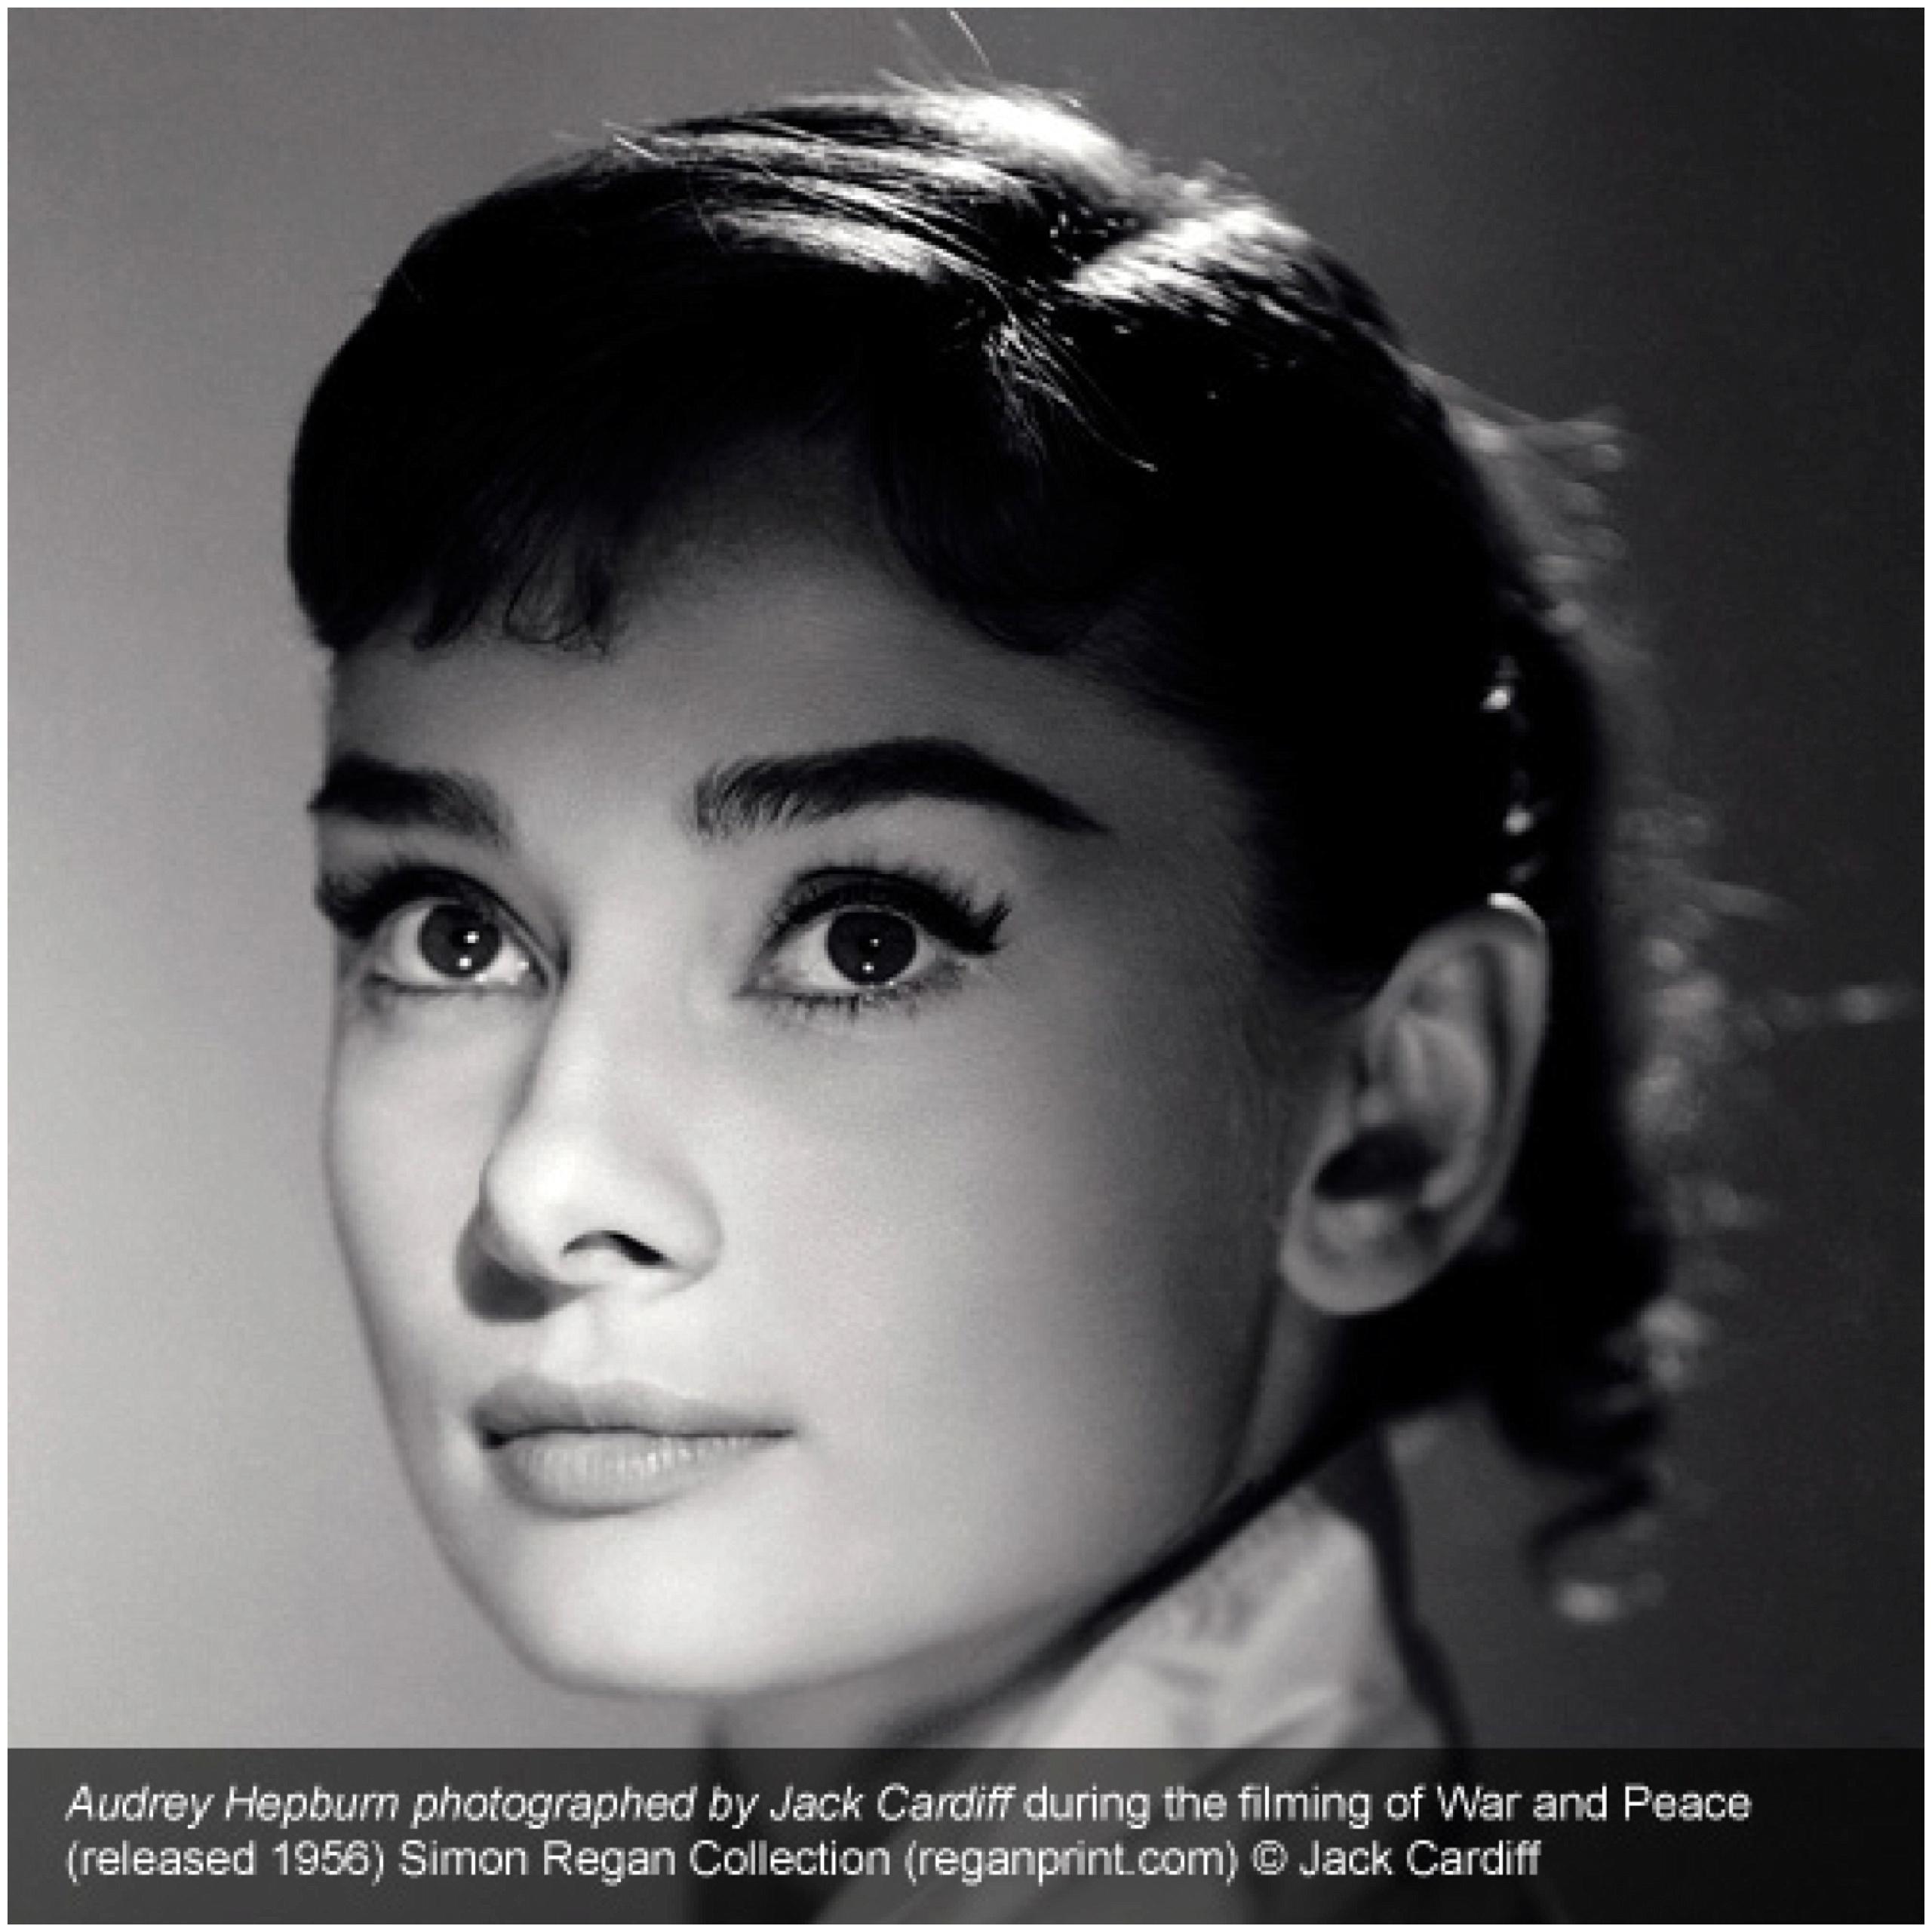 Audrey Hepburn: Portrait of an Icon